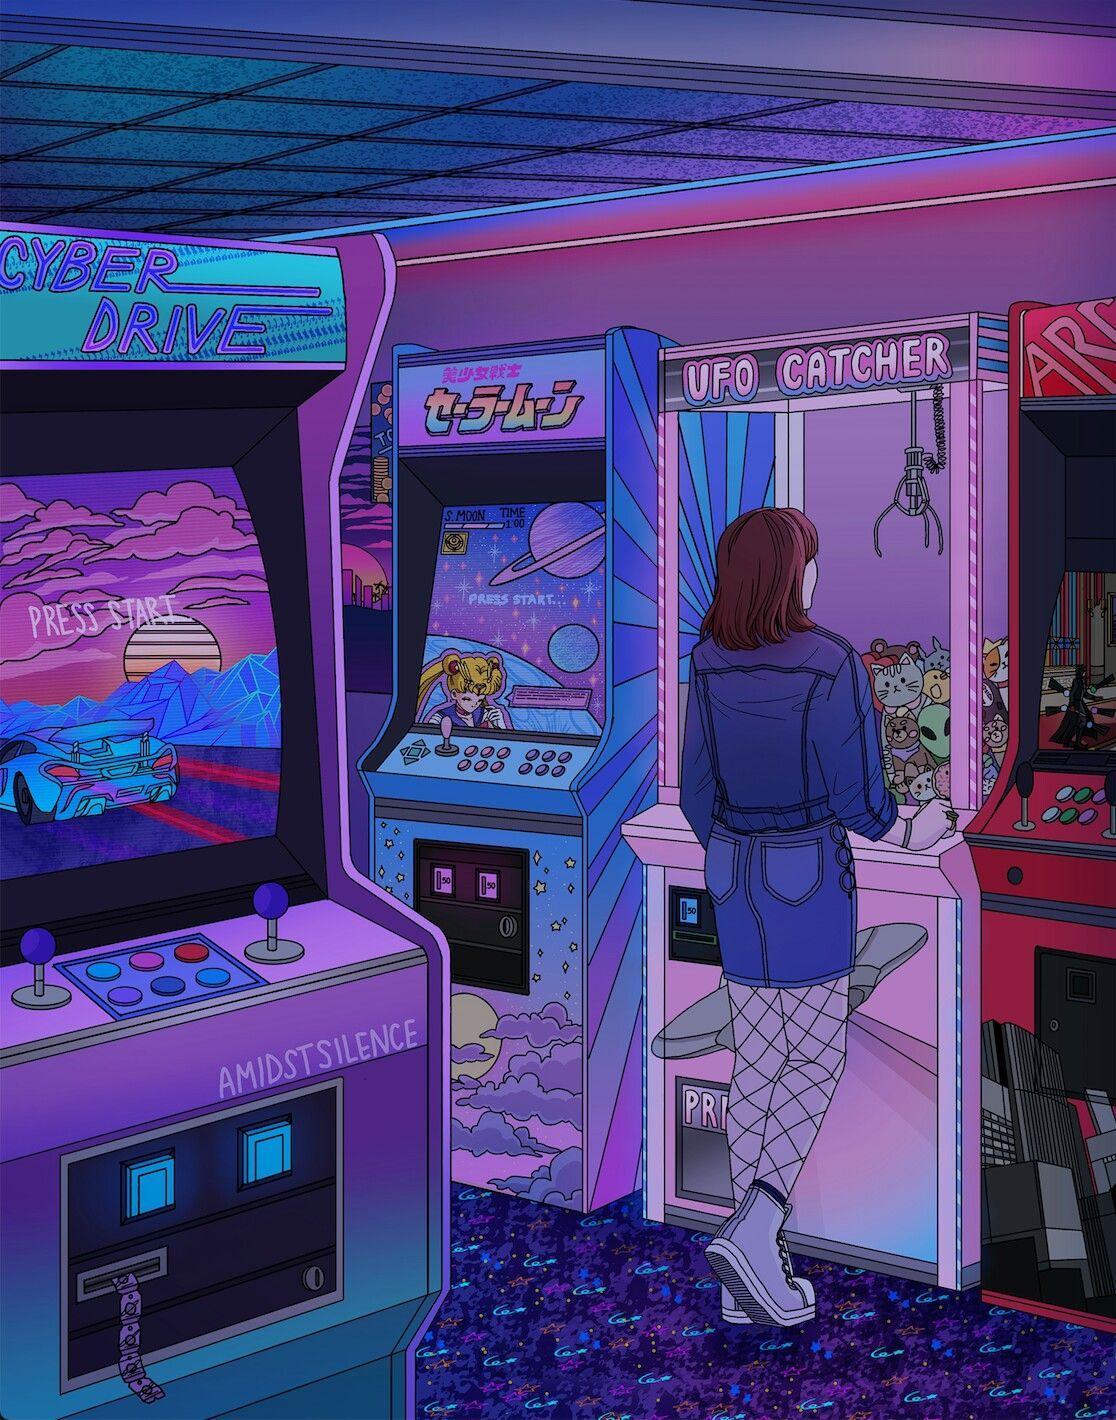 Pin By Joey Berndt On Music Aesthetic Anime Pixel Art Landscape